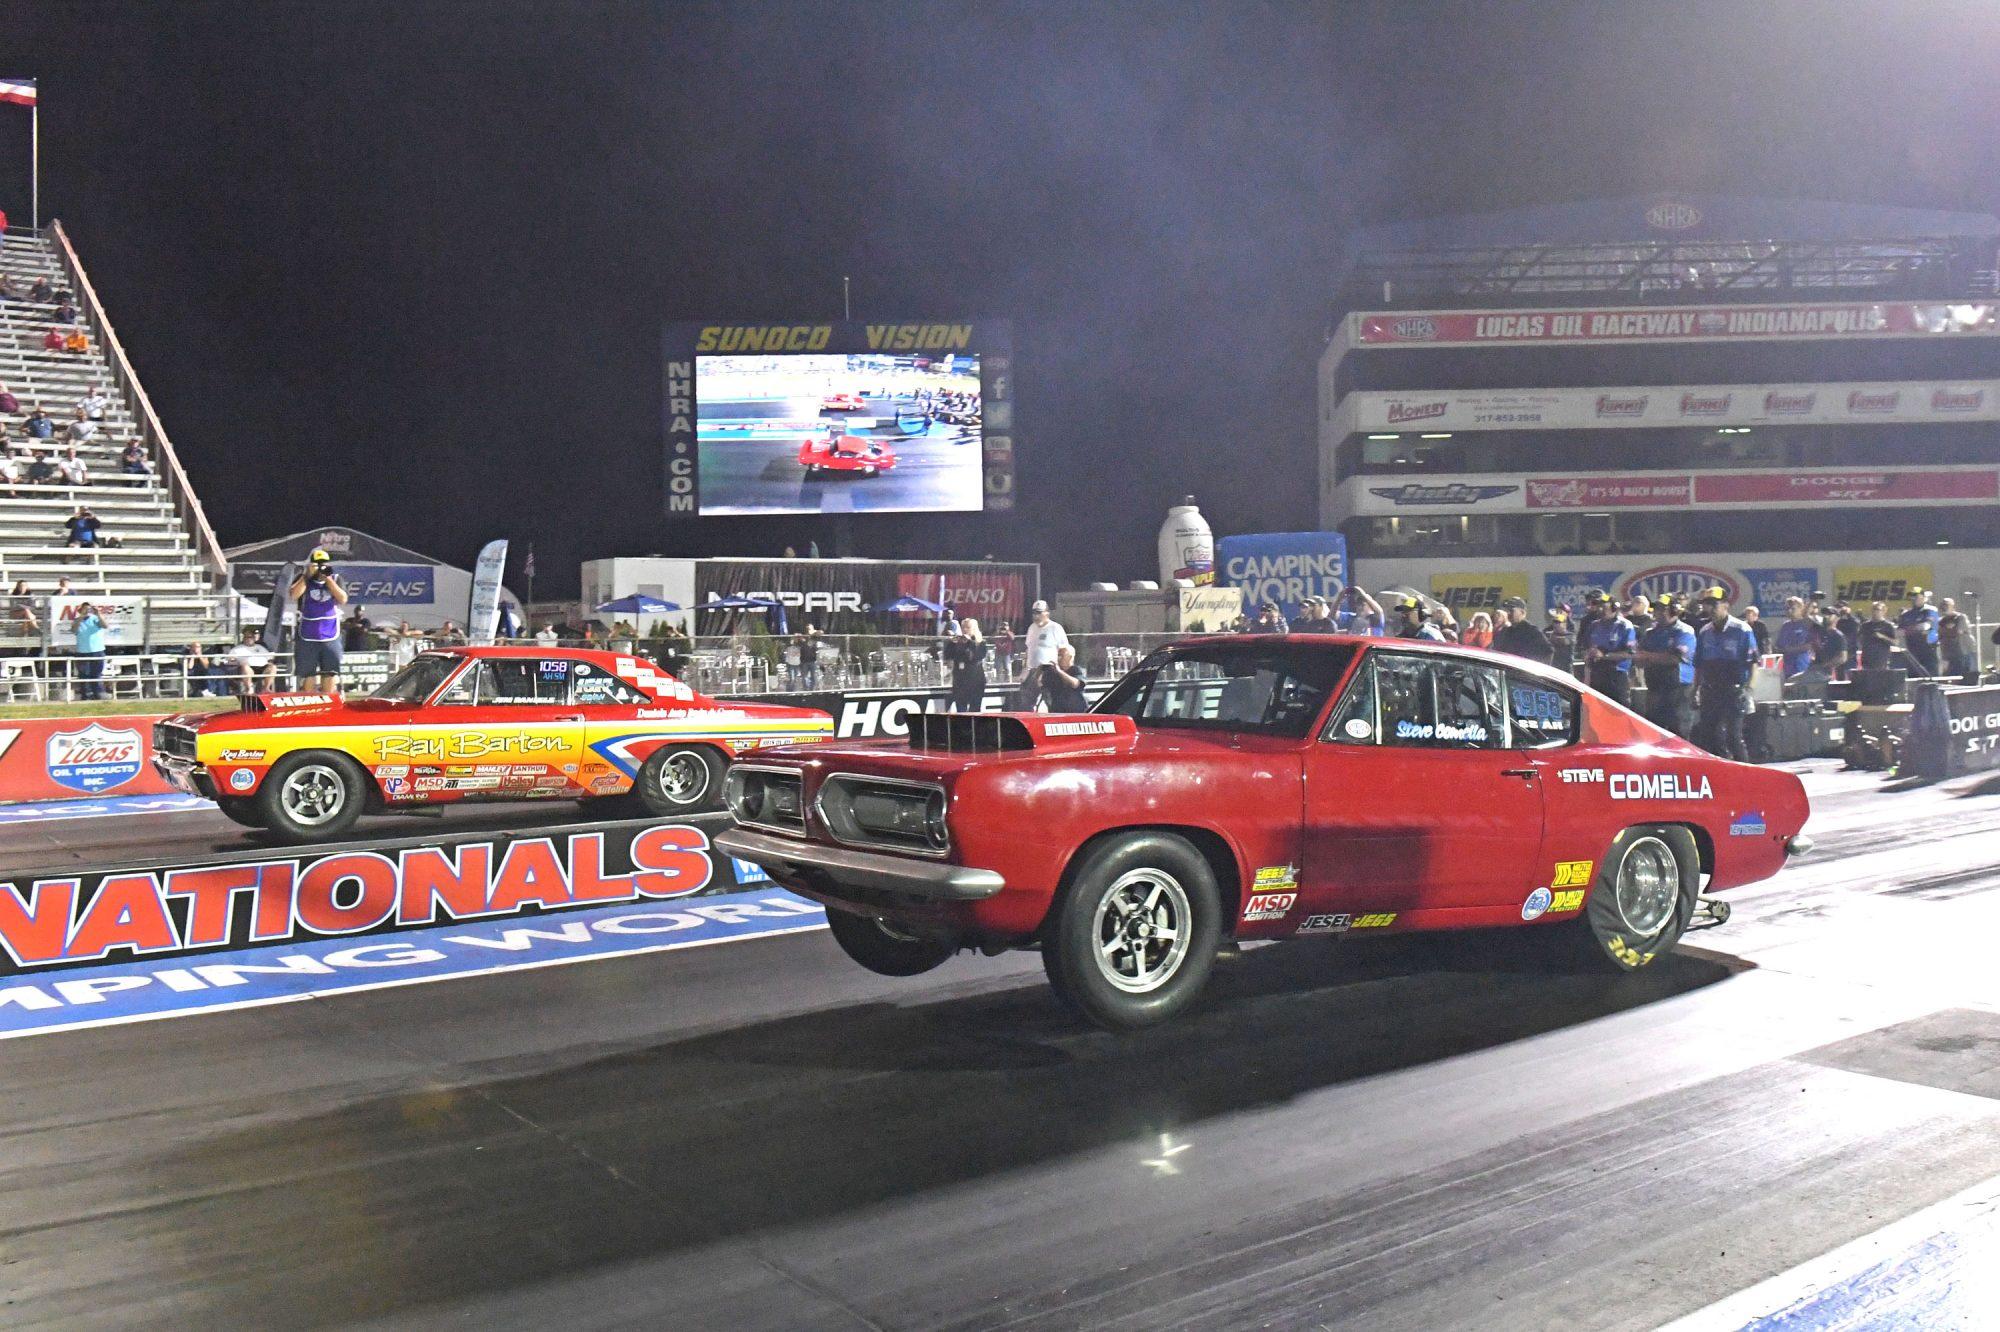 2 cars drag racing